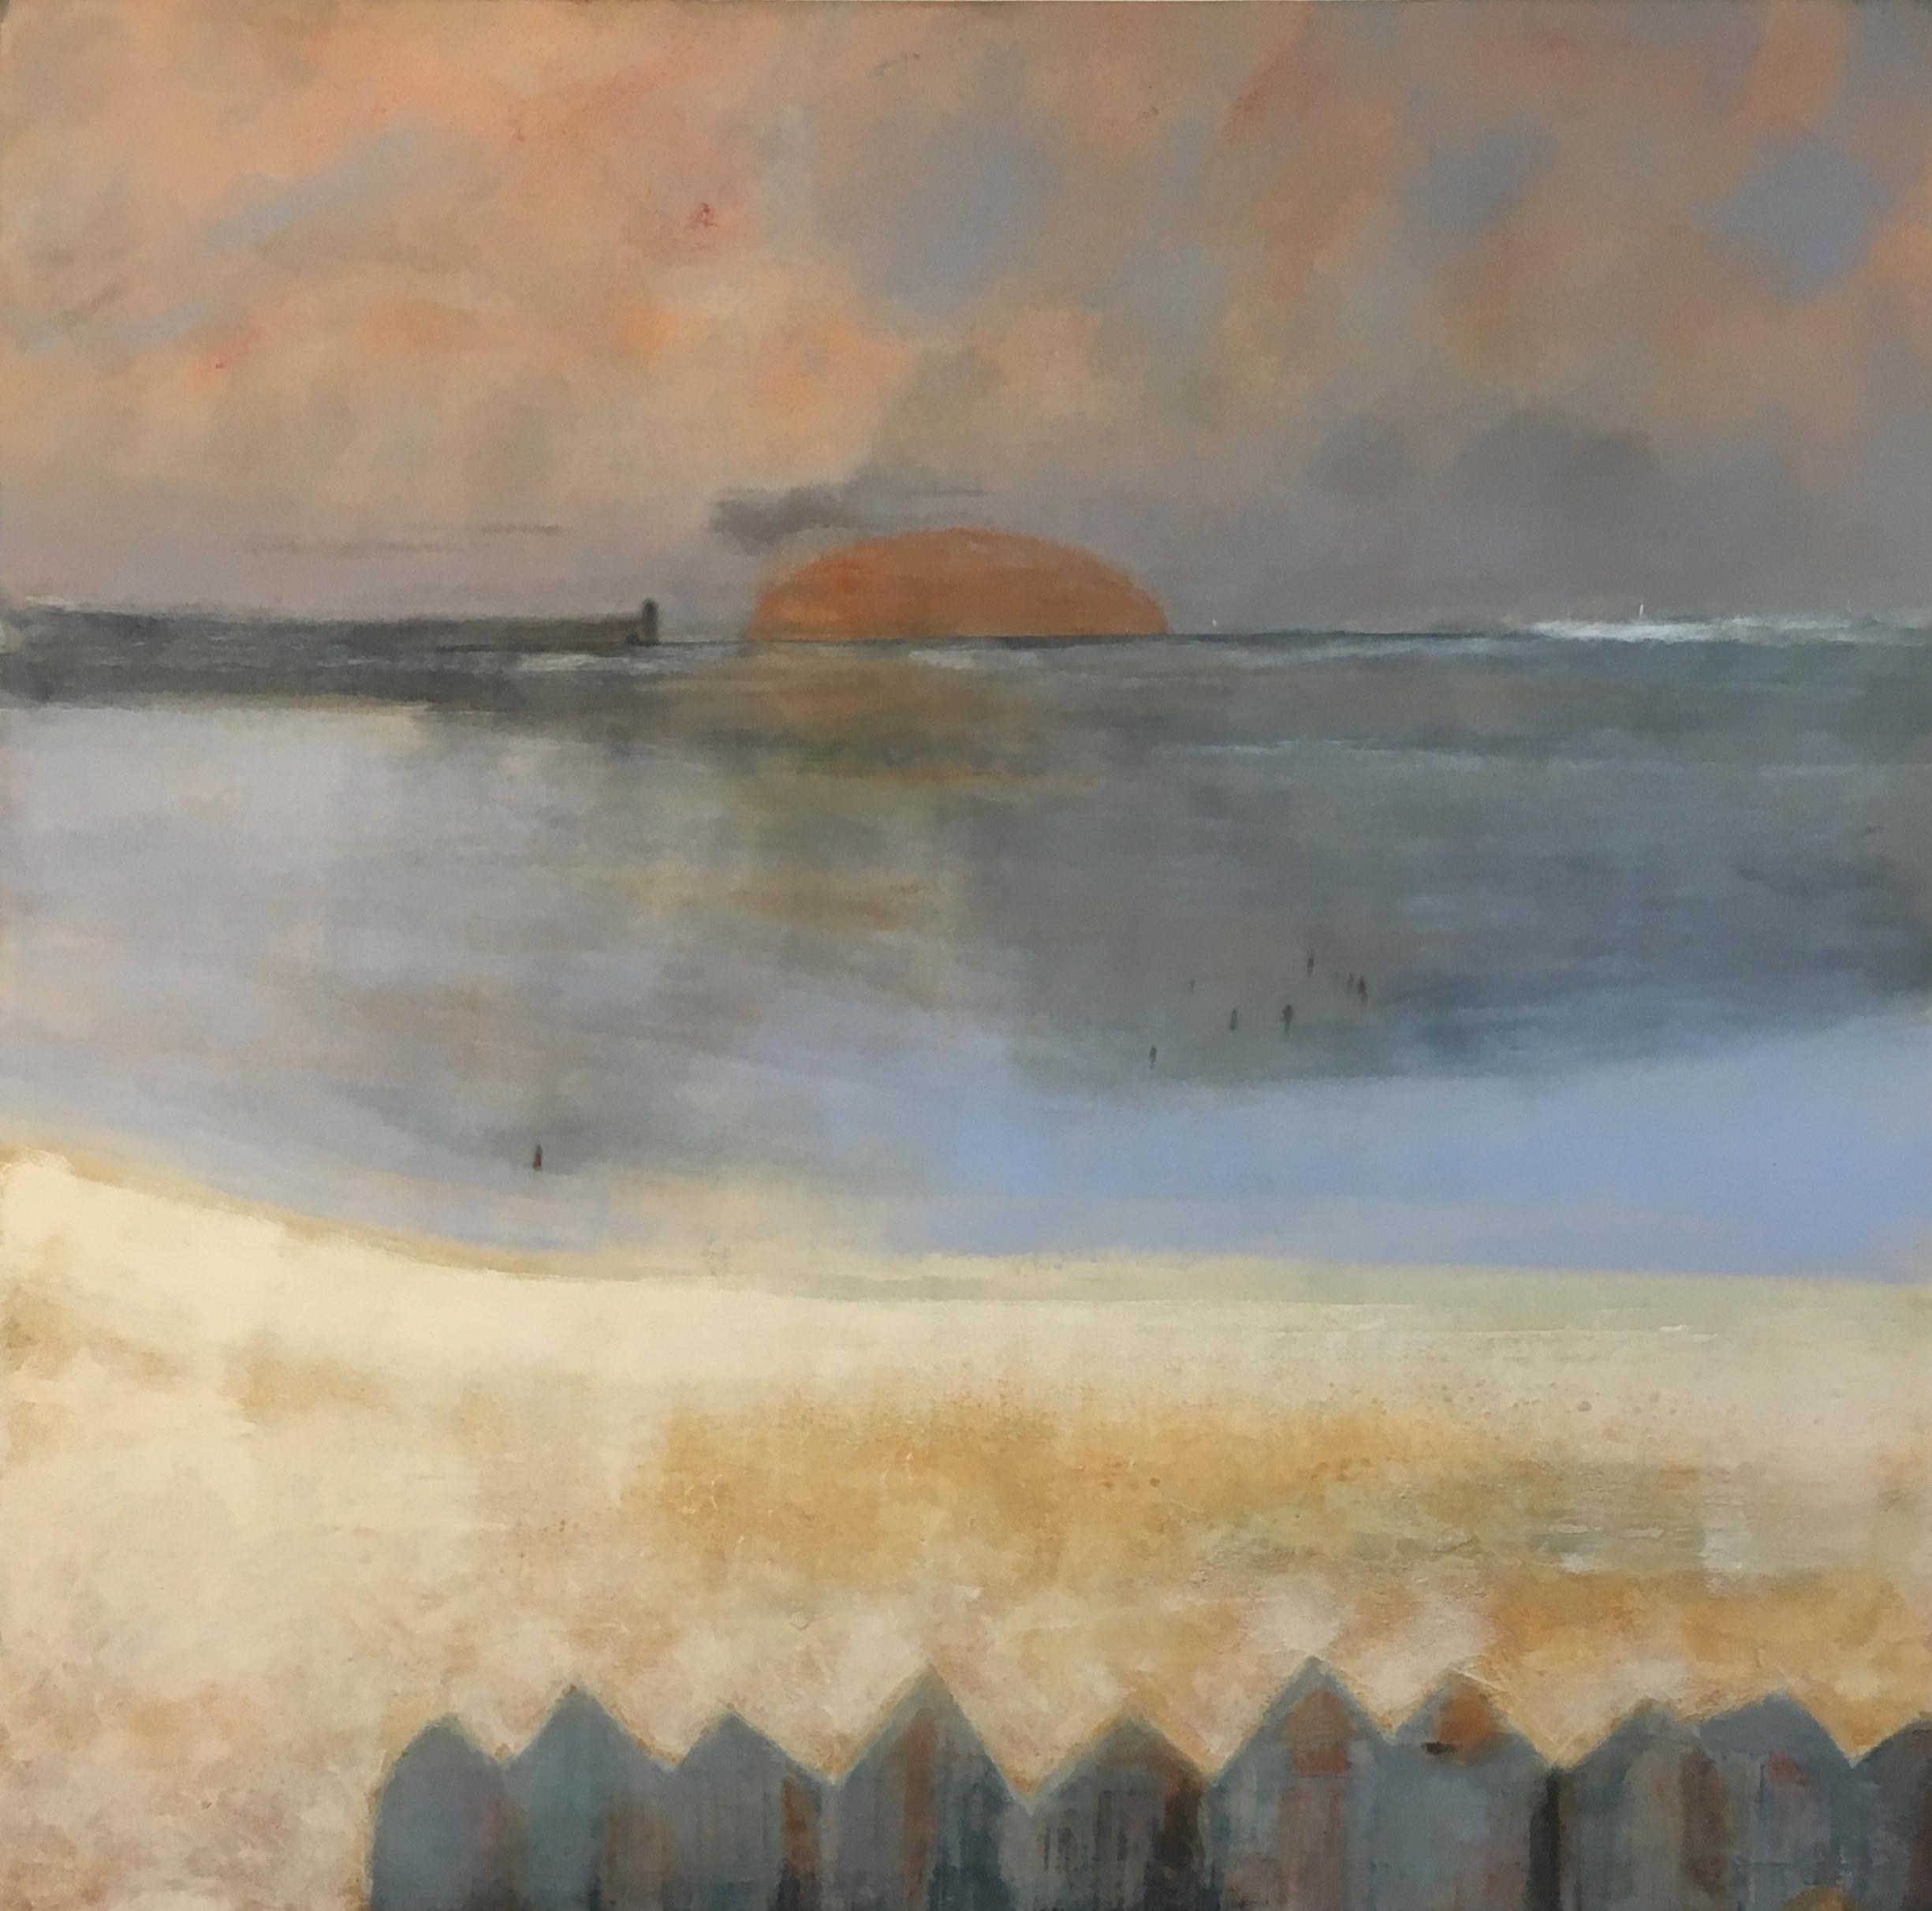 purosely wandering - Karen Macwhinni